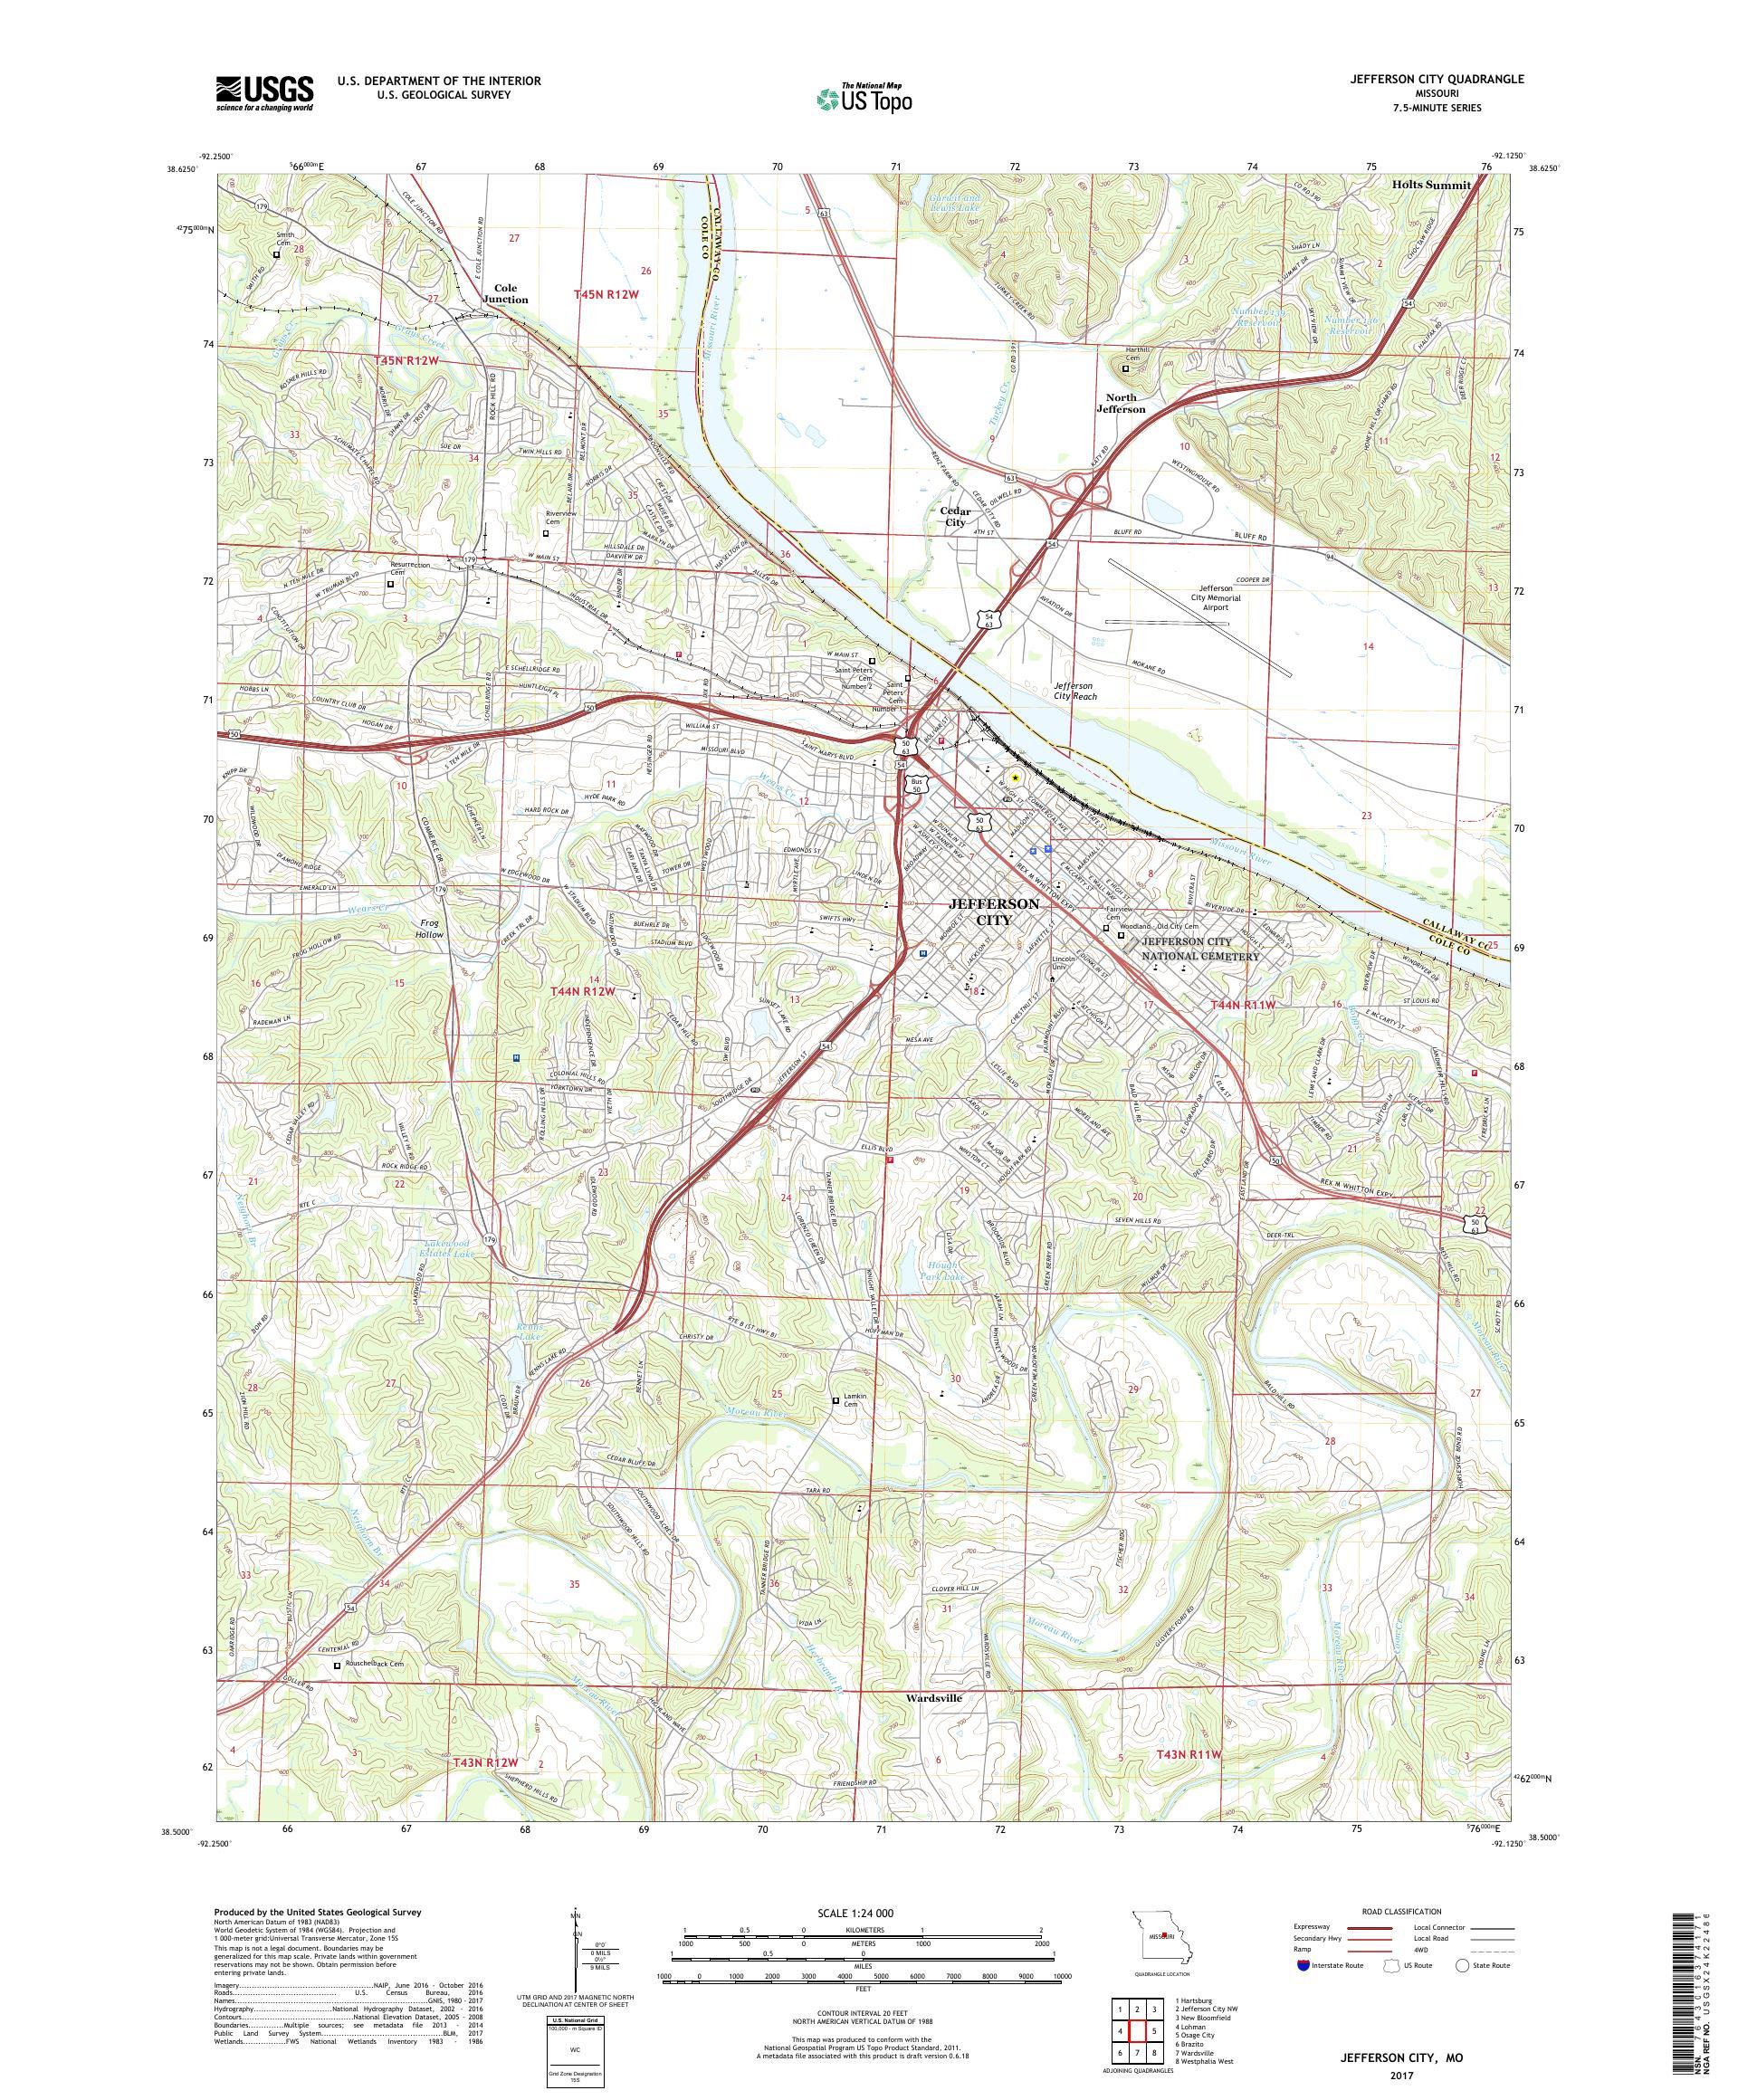 MyTopo Jefferson City, Missouri USGS Quad Topo Map